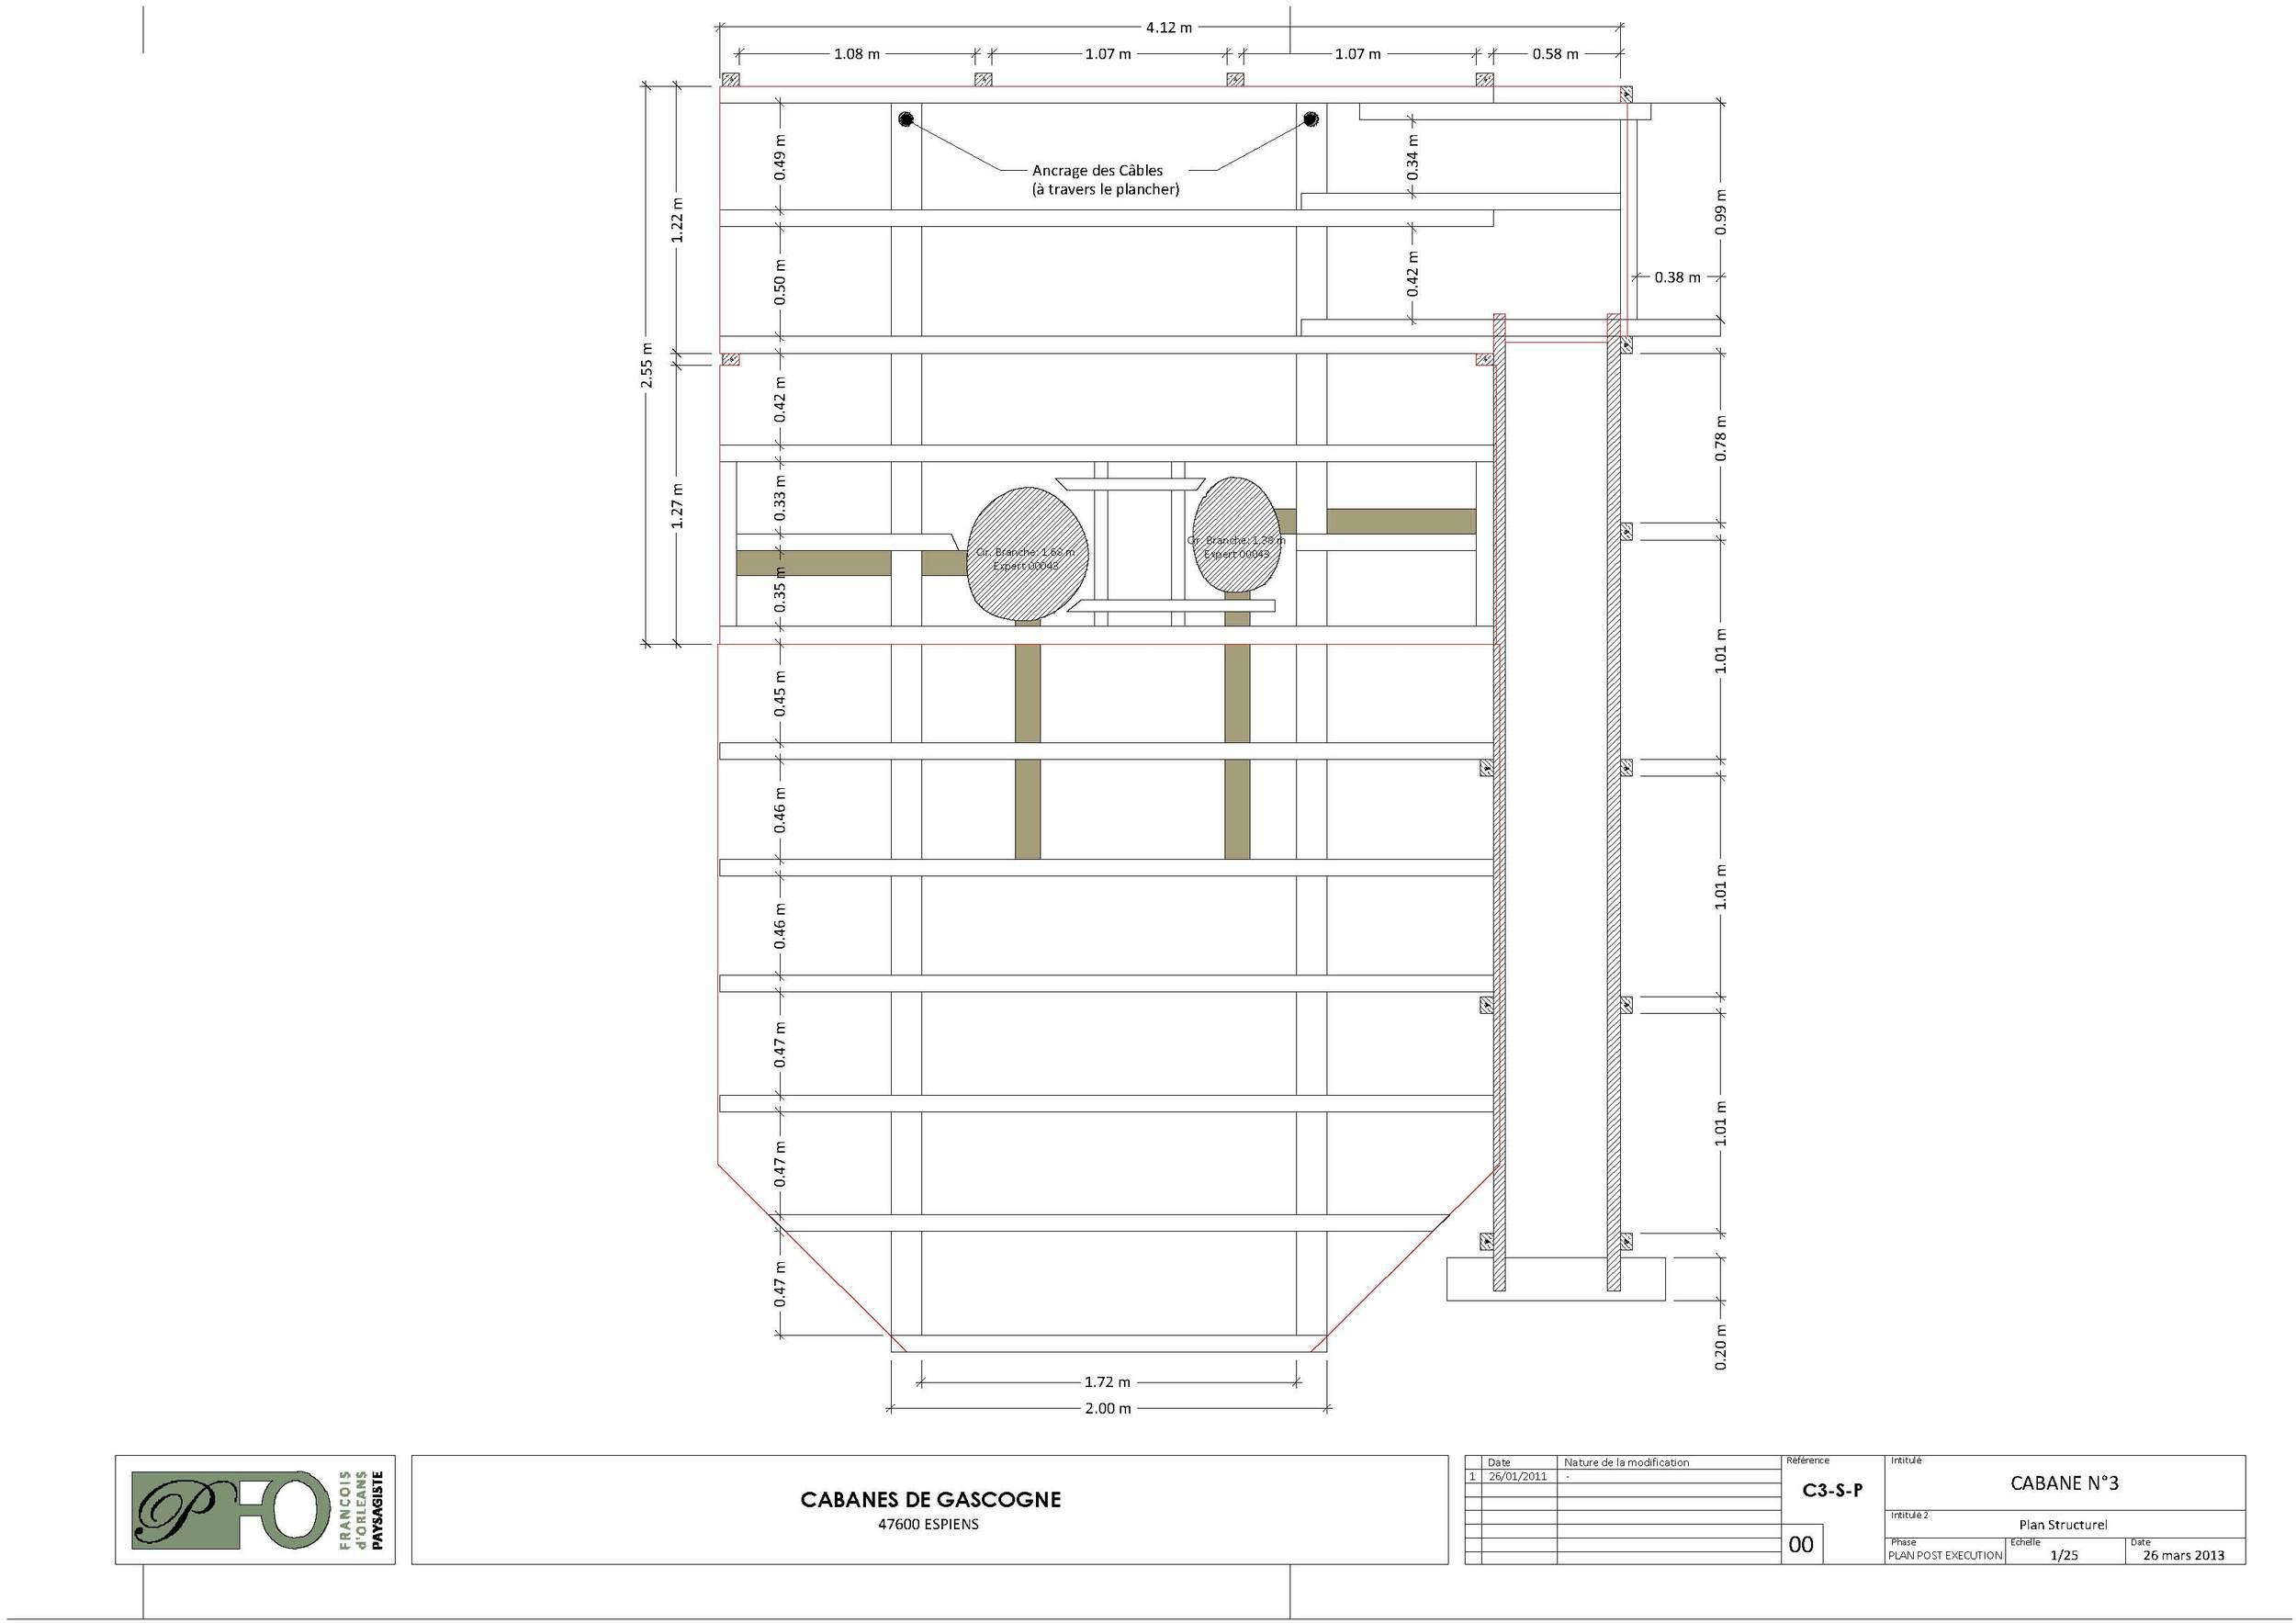 ARCONQUE - MERODE 2013.04.09-C3-S-P.jpg